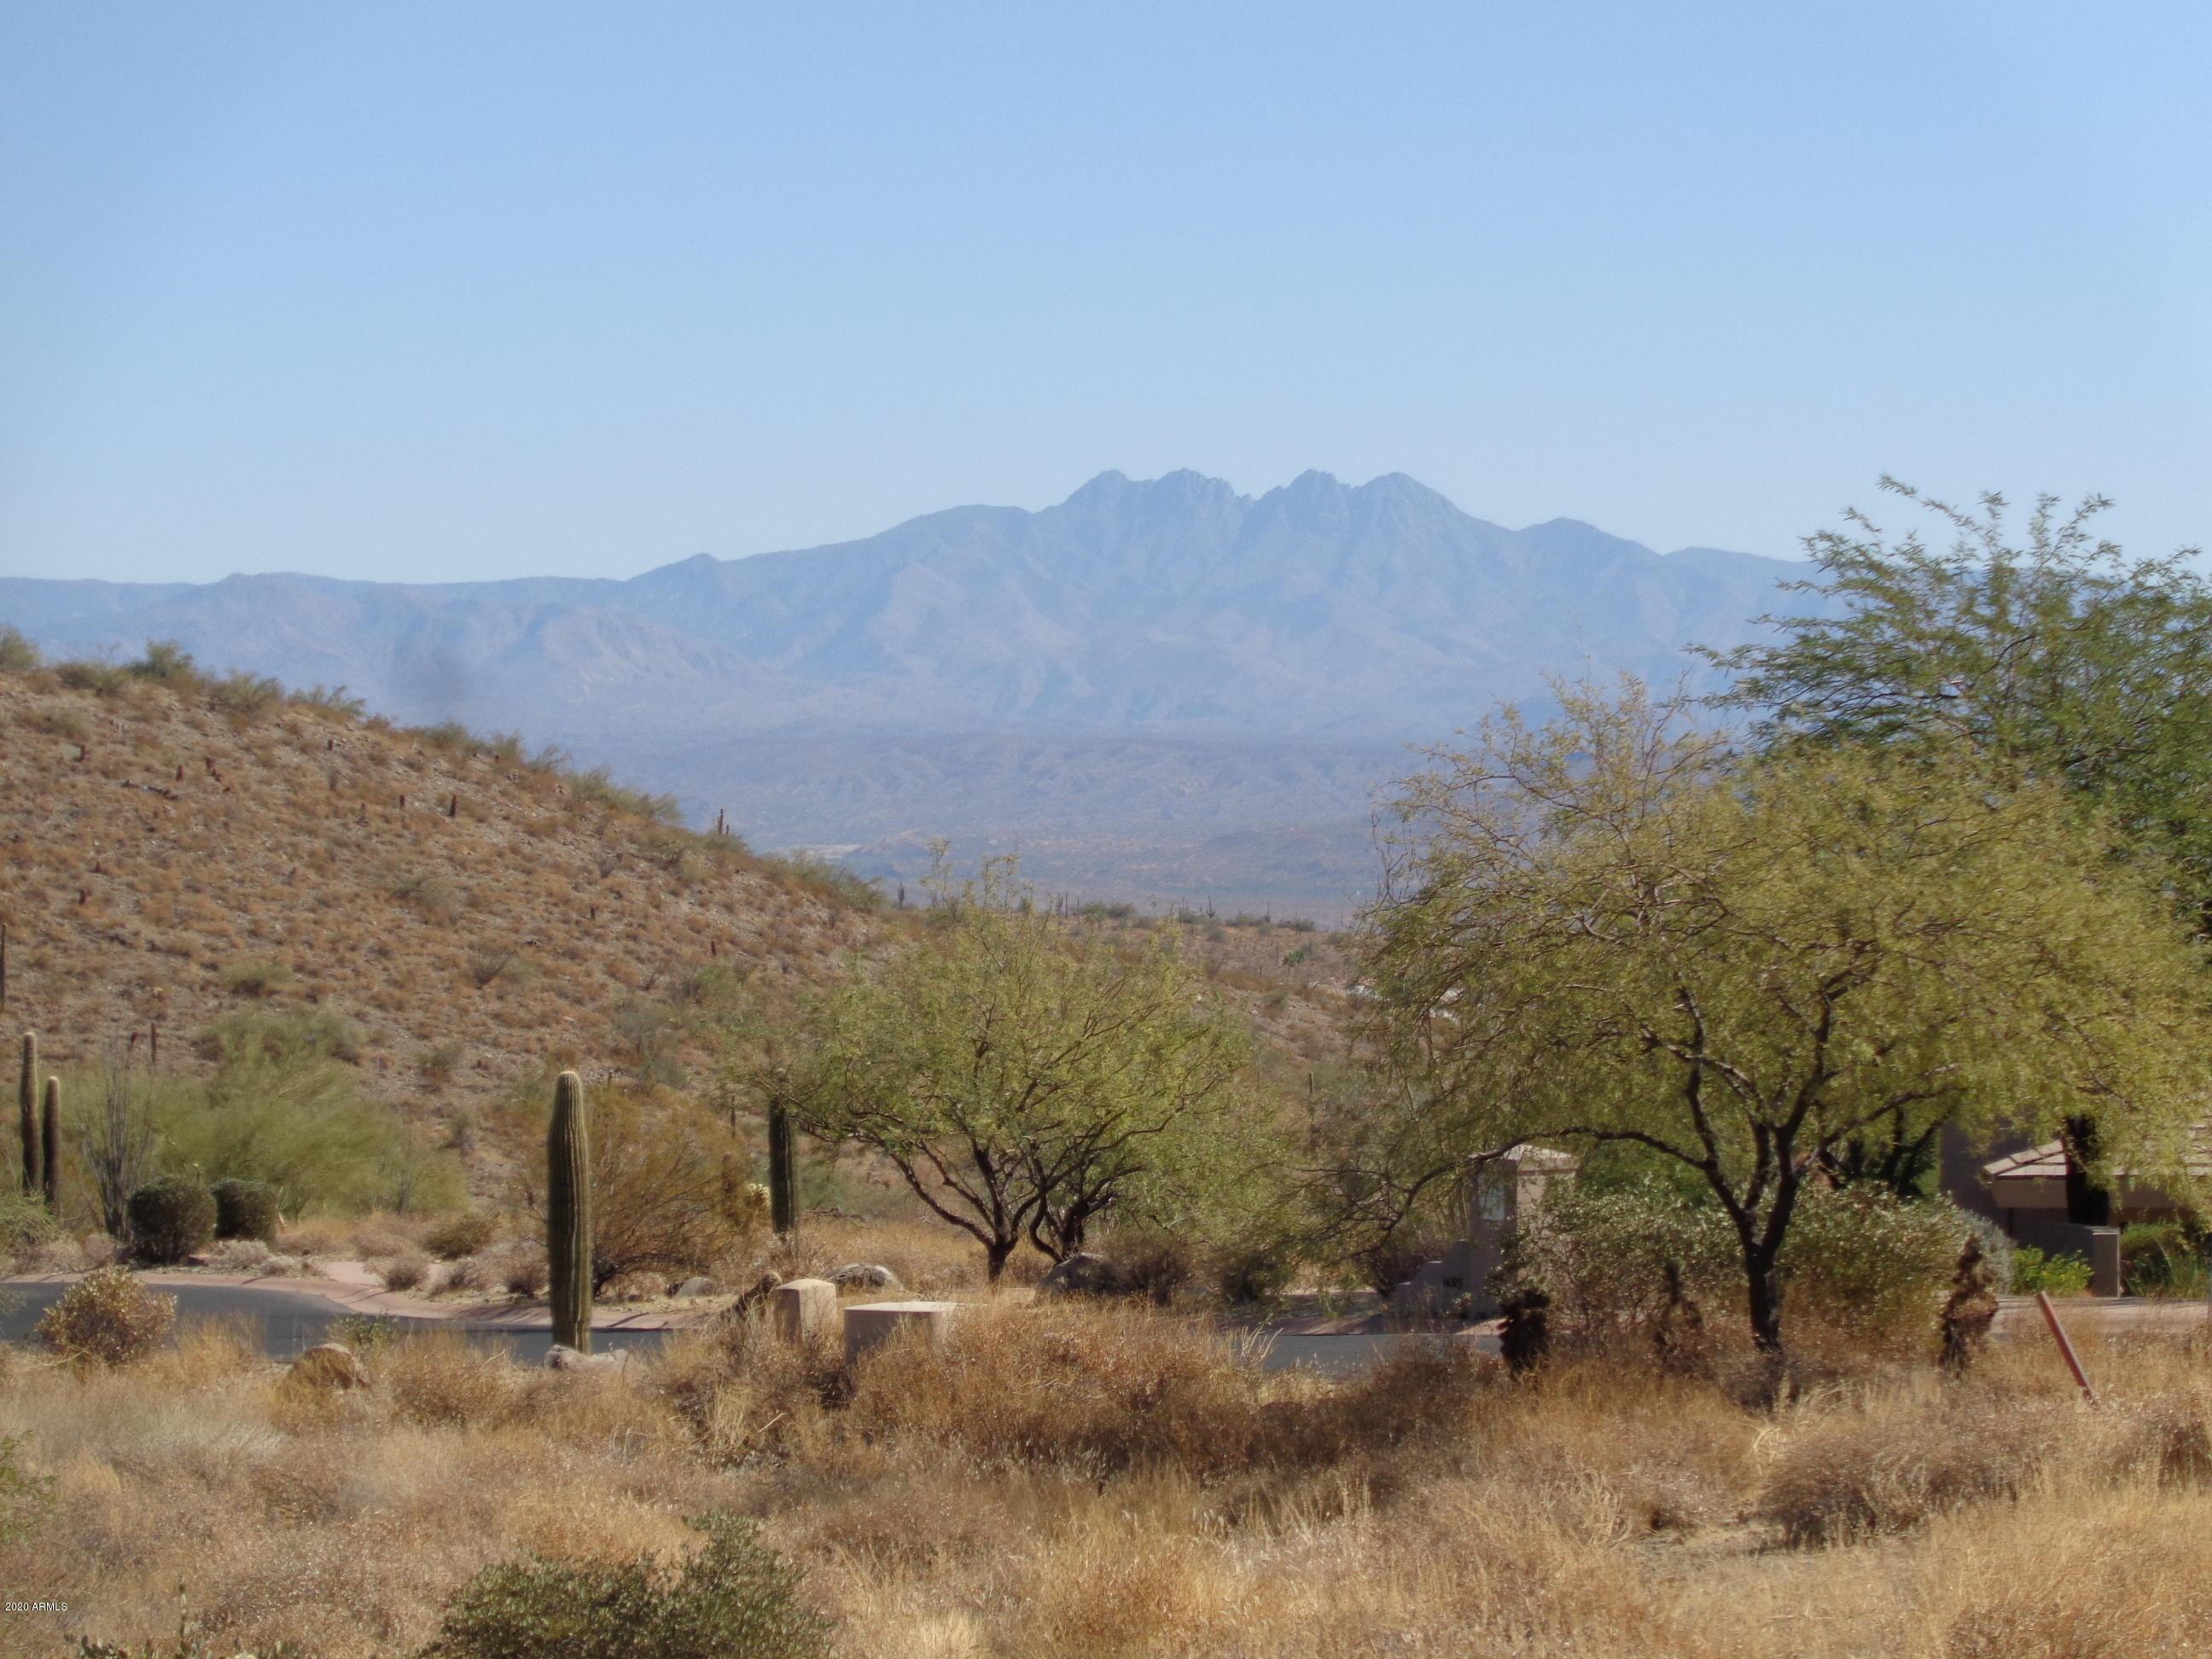 14310 E Desert Tortoise Trail # 33, Fountain Hills, AZ 85268, ,Land,For Sale,14310 E Desert Tortoise Trail # 33,6149874